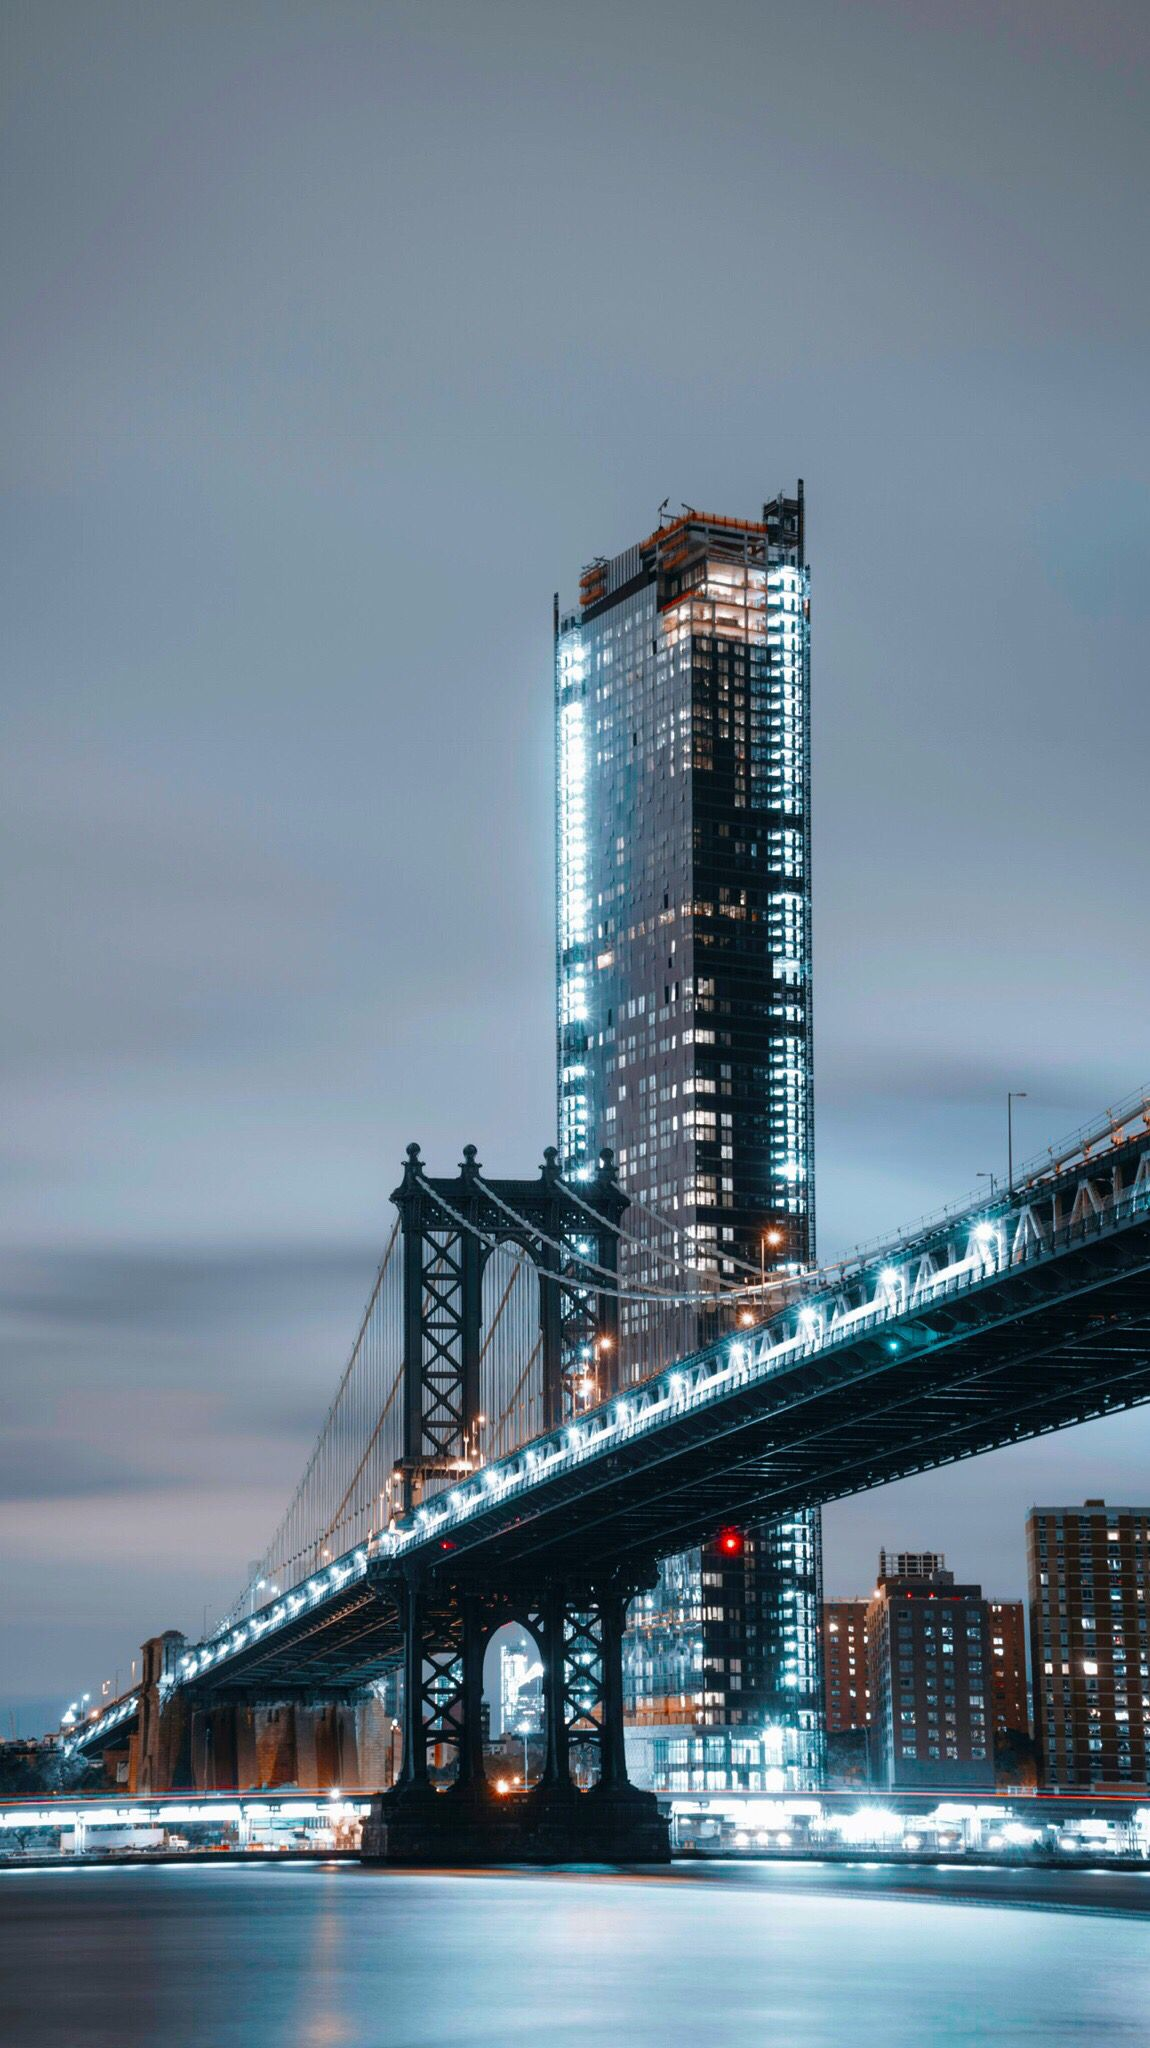 59 Th Street Bridge Nyc Newyork Newyorkcity